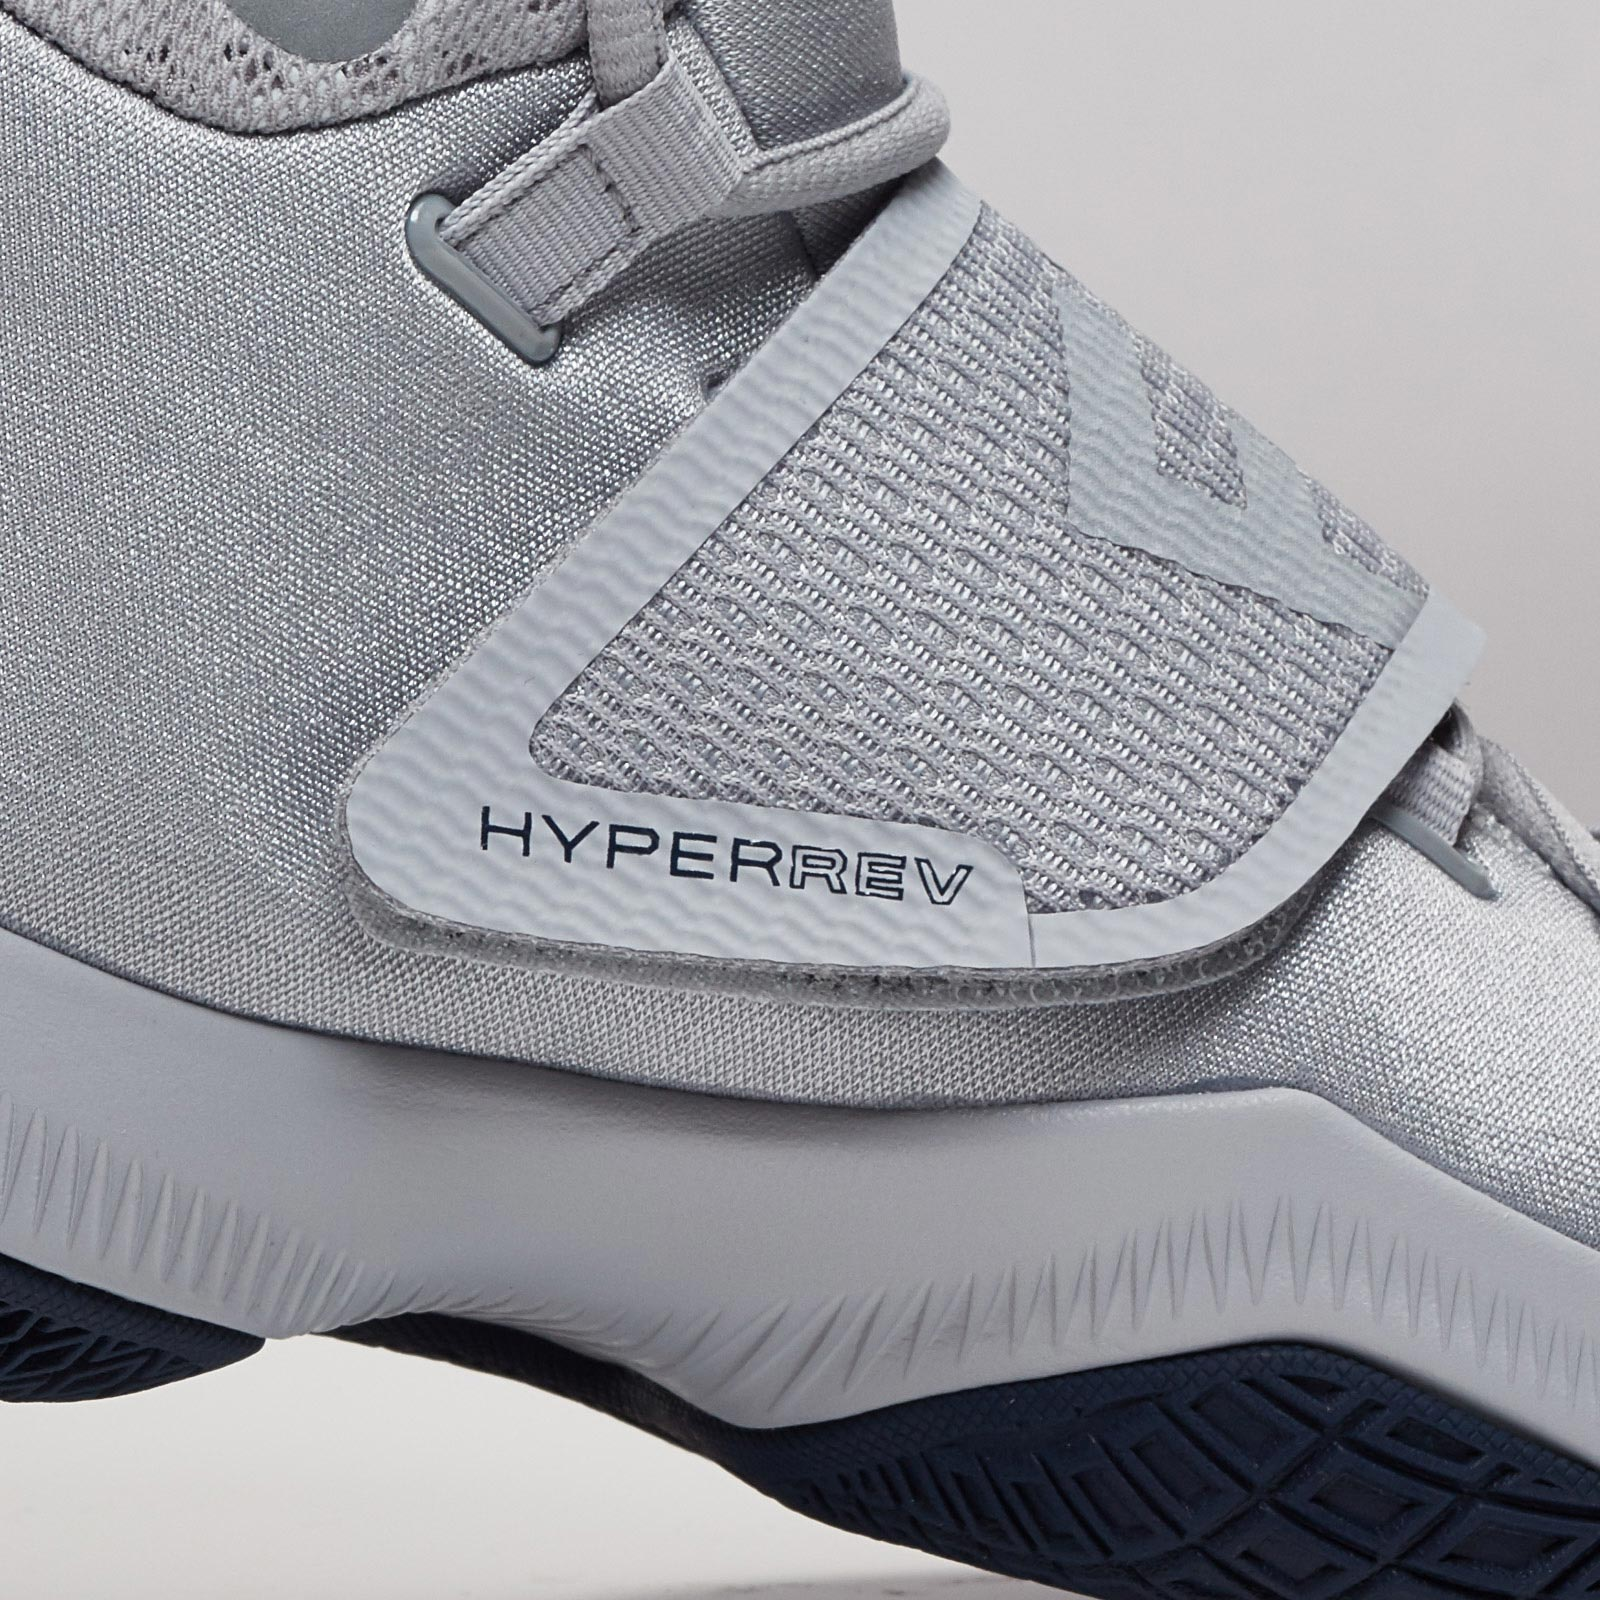 c507df03a6d8 Nike Zoom Hyperrev 2016 Fragment - 848556-004 - Sneakersnstuff ...